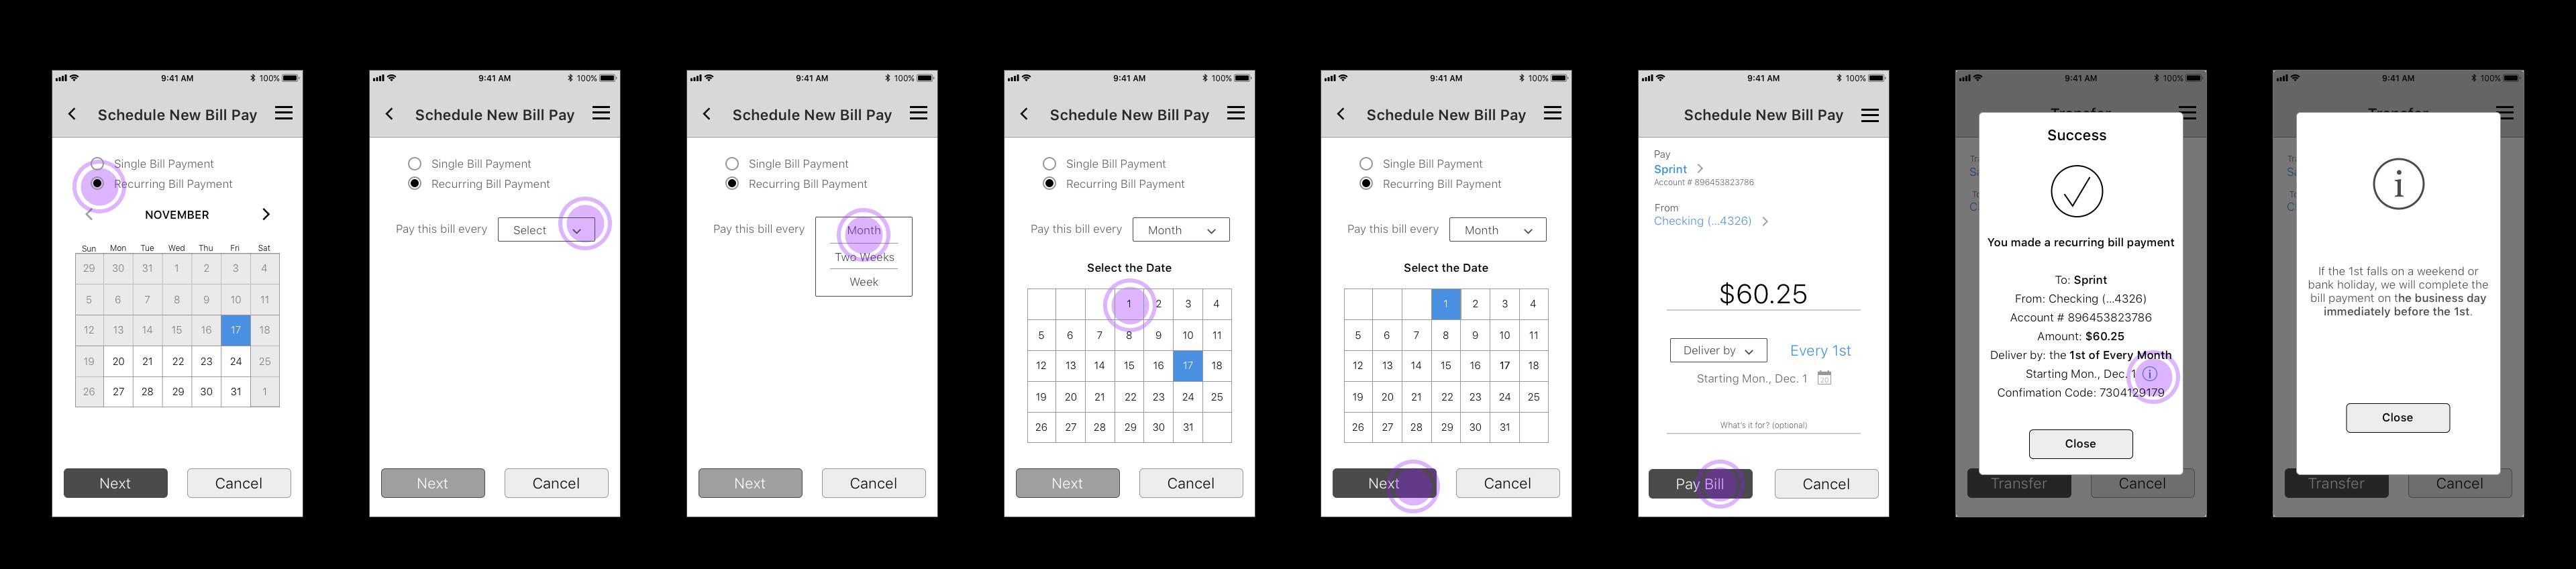 vcu payment plan photo - 1